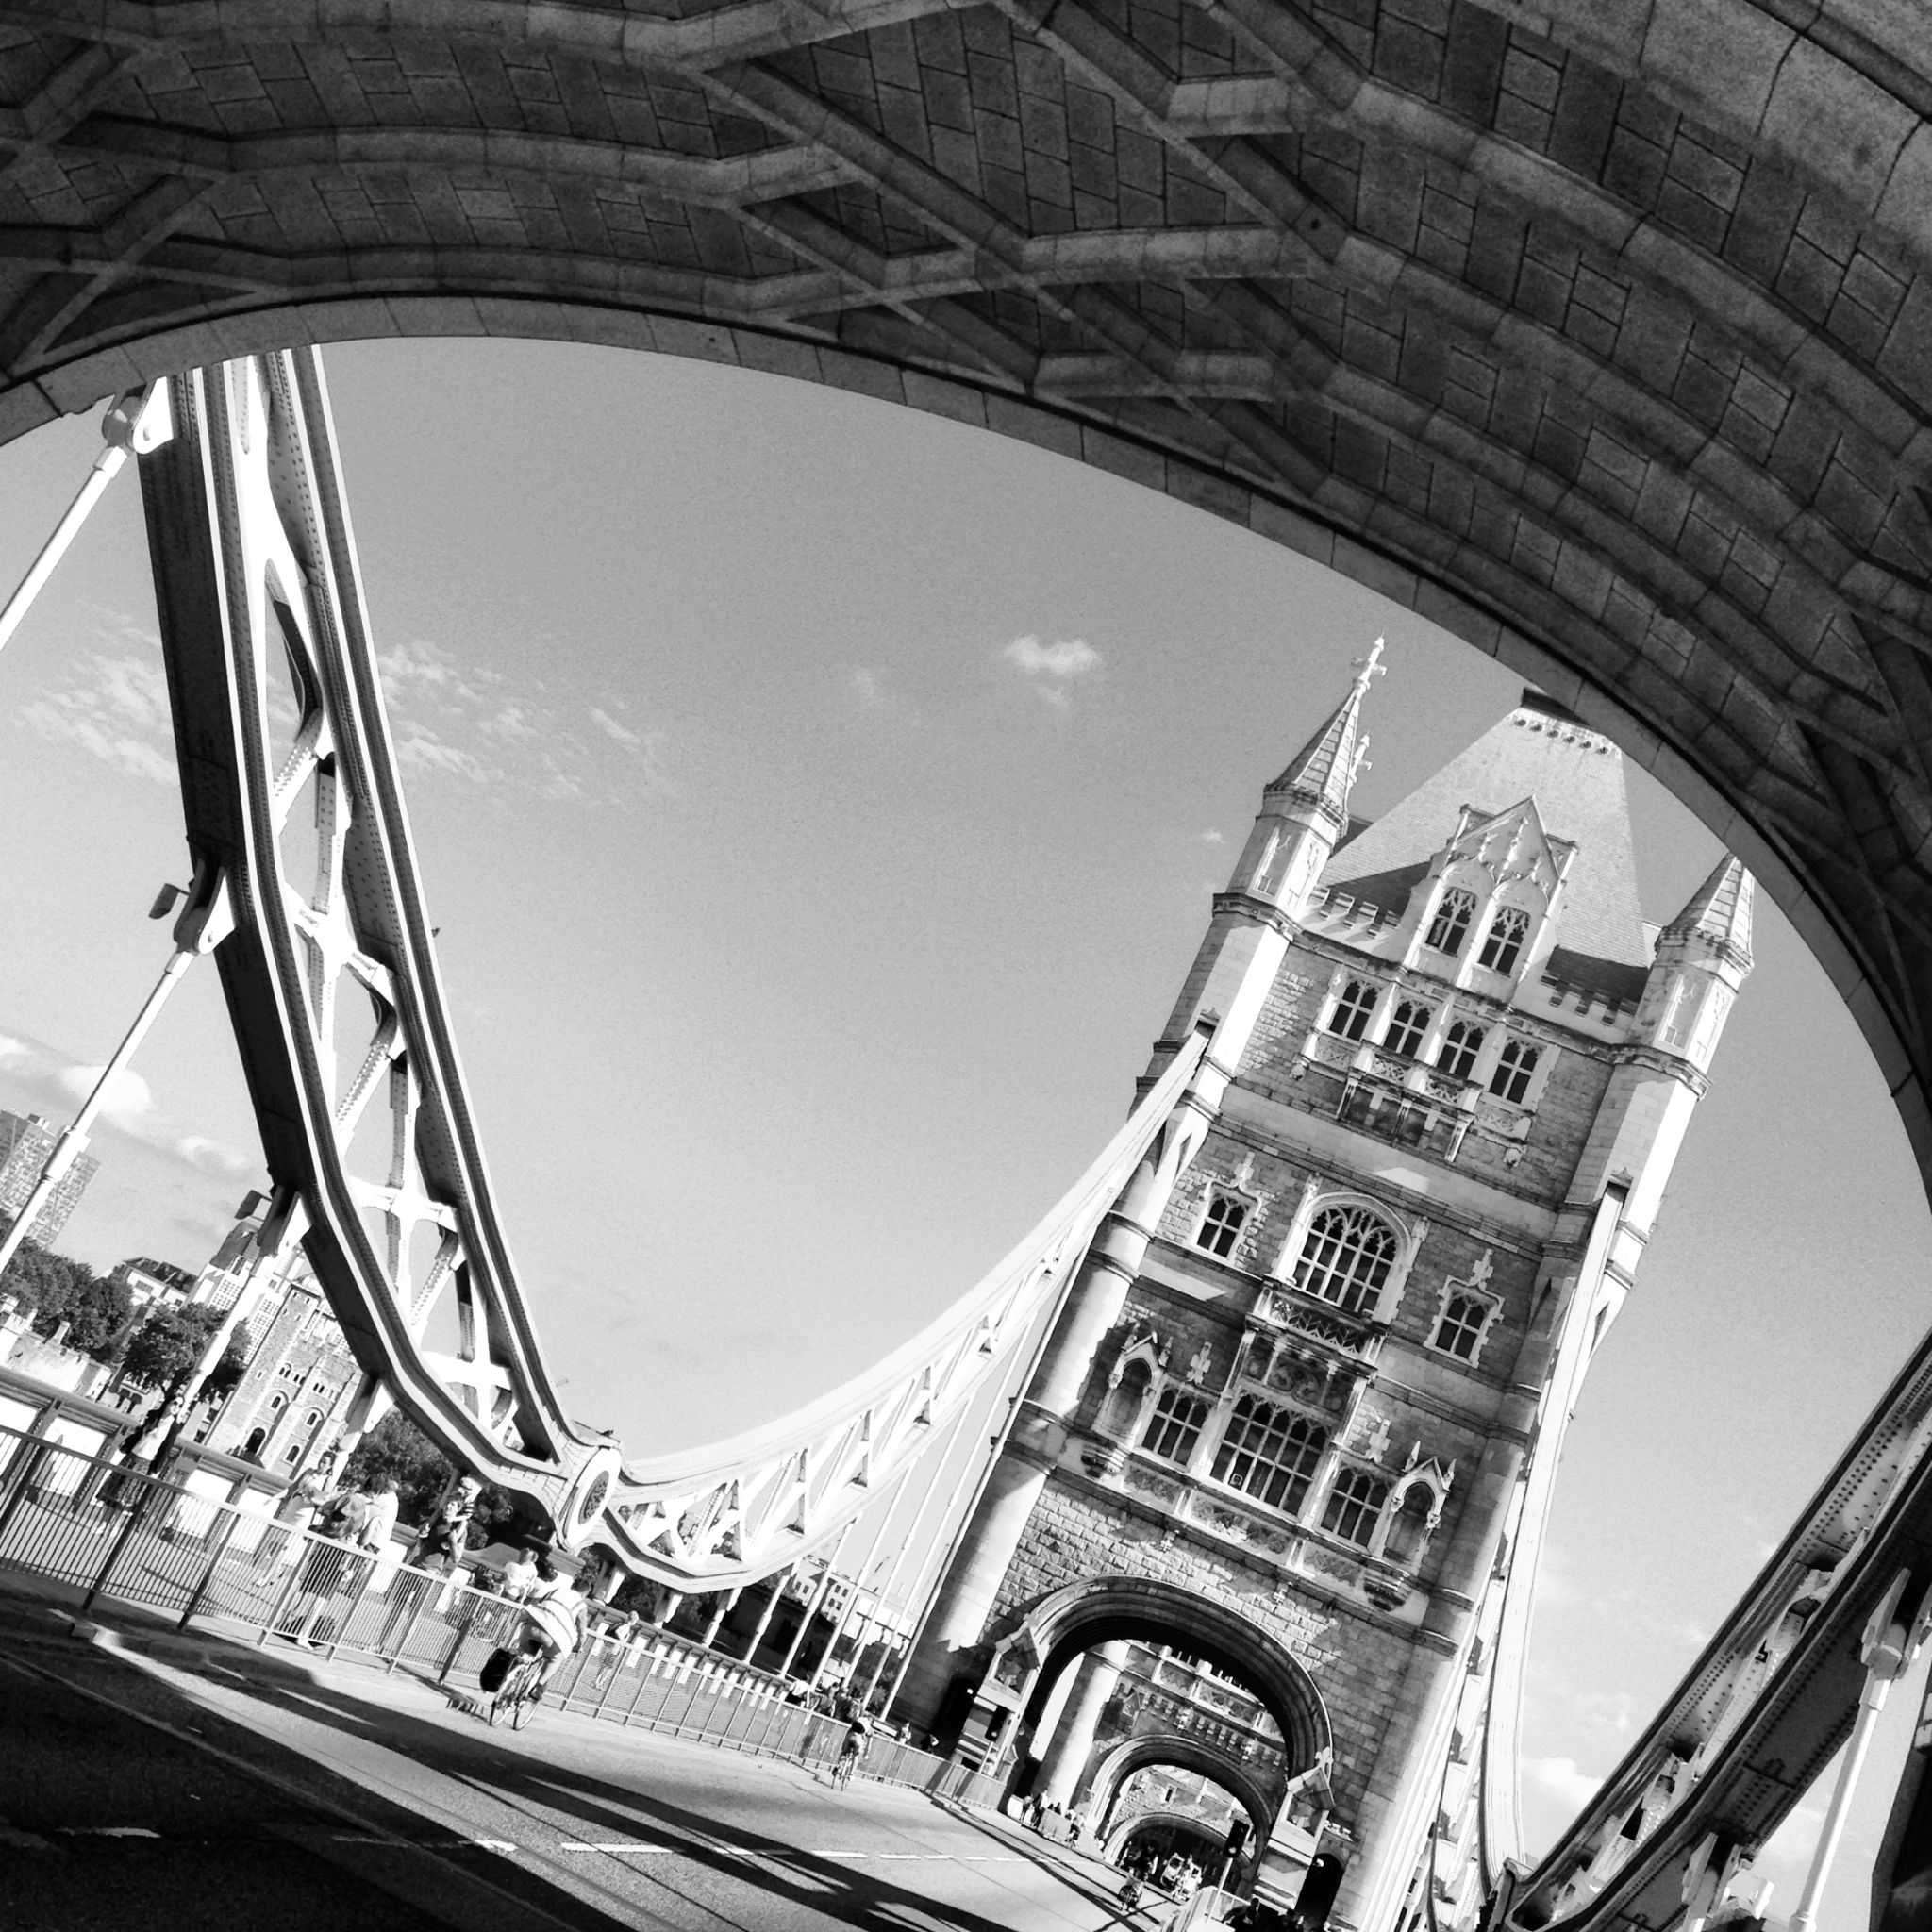 Tower Bridge by Eddy Sleiman